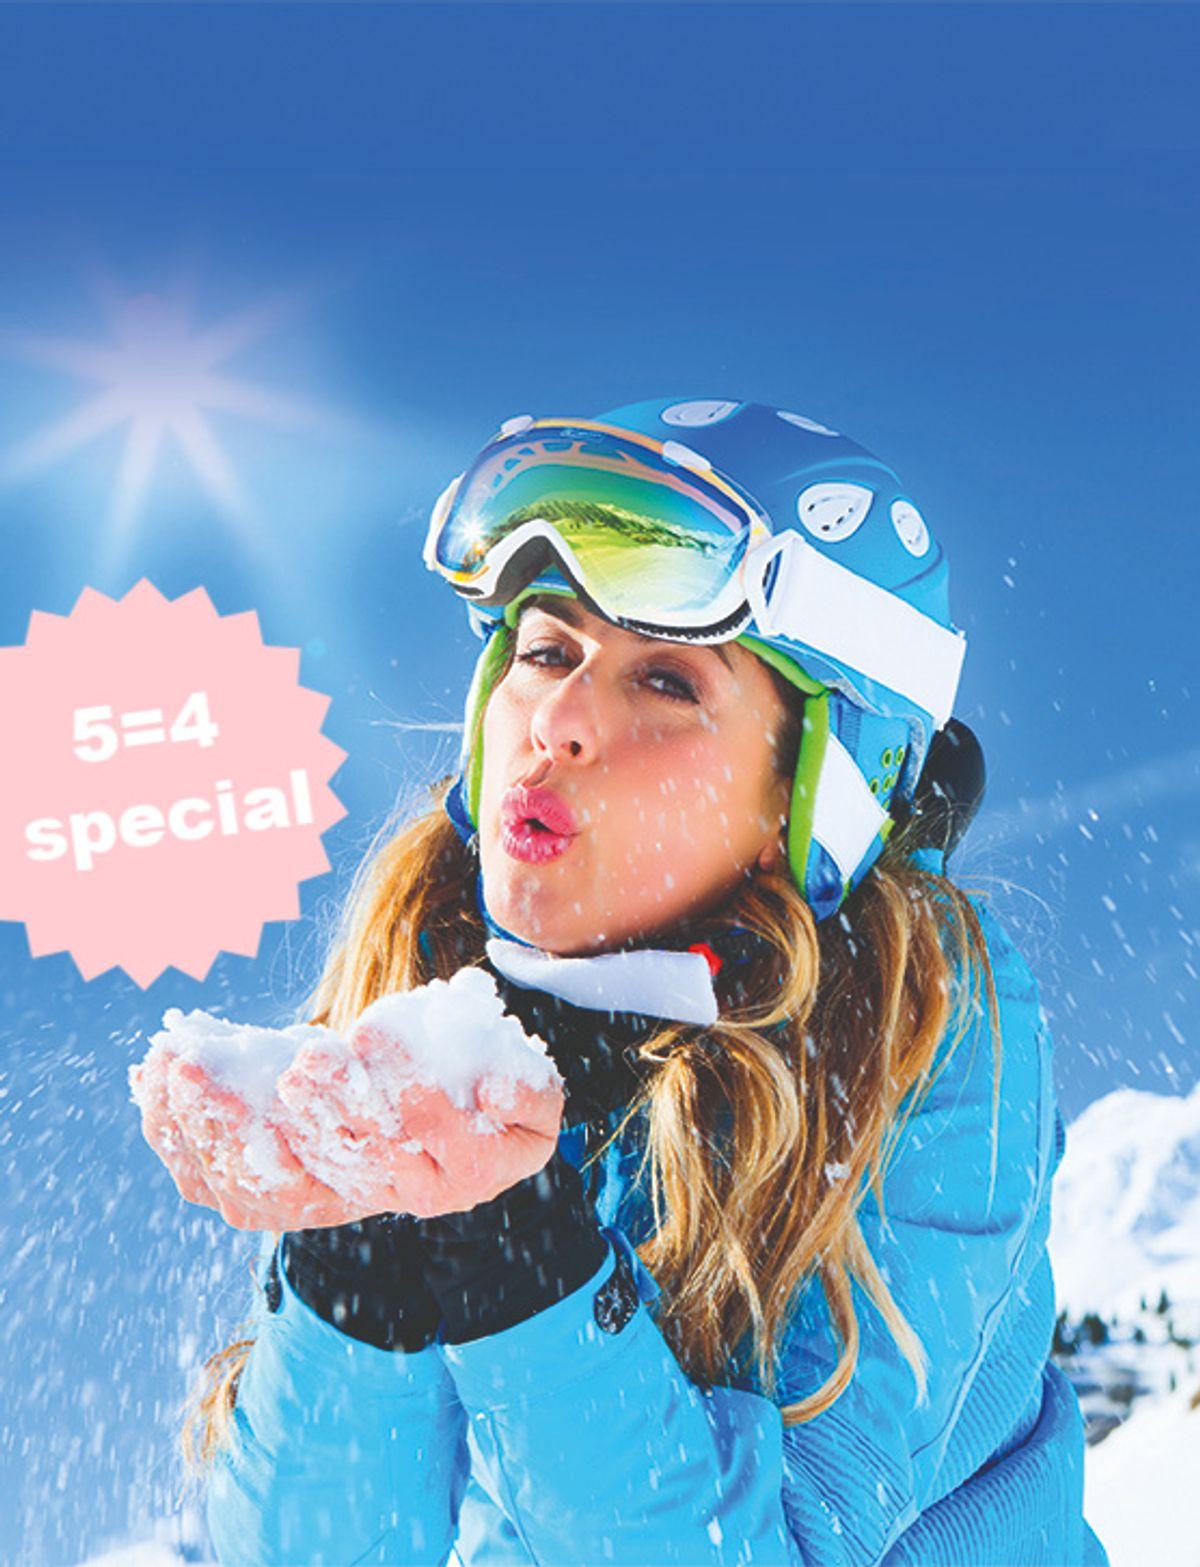 Ski Classic Deluxe 5=4 Special | 1 Tag & 1 Nacht geschenkt